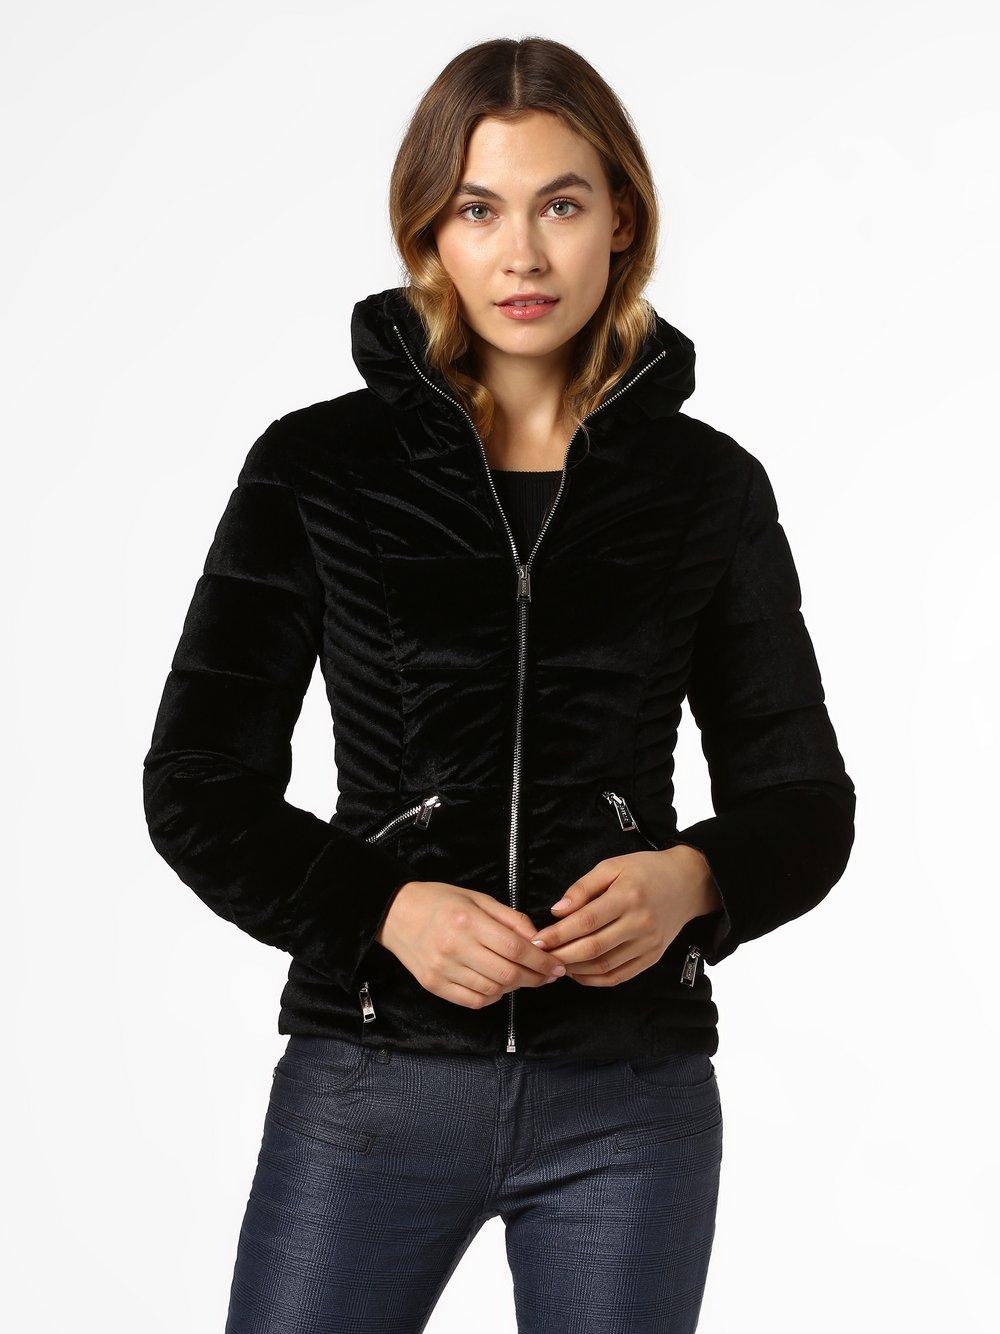 Guess Jeans Damska kurtka pikowana kup online | VANGRAAF.COM